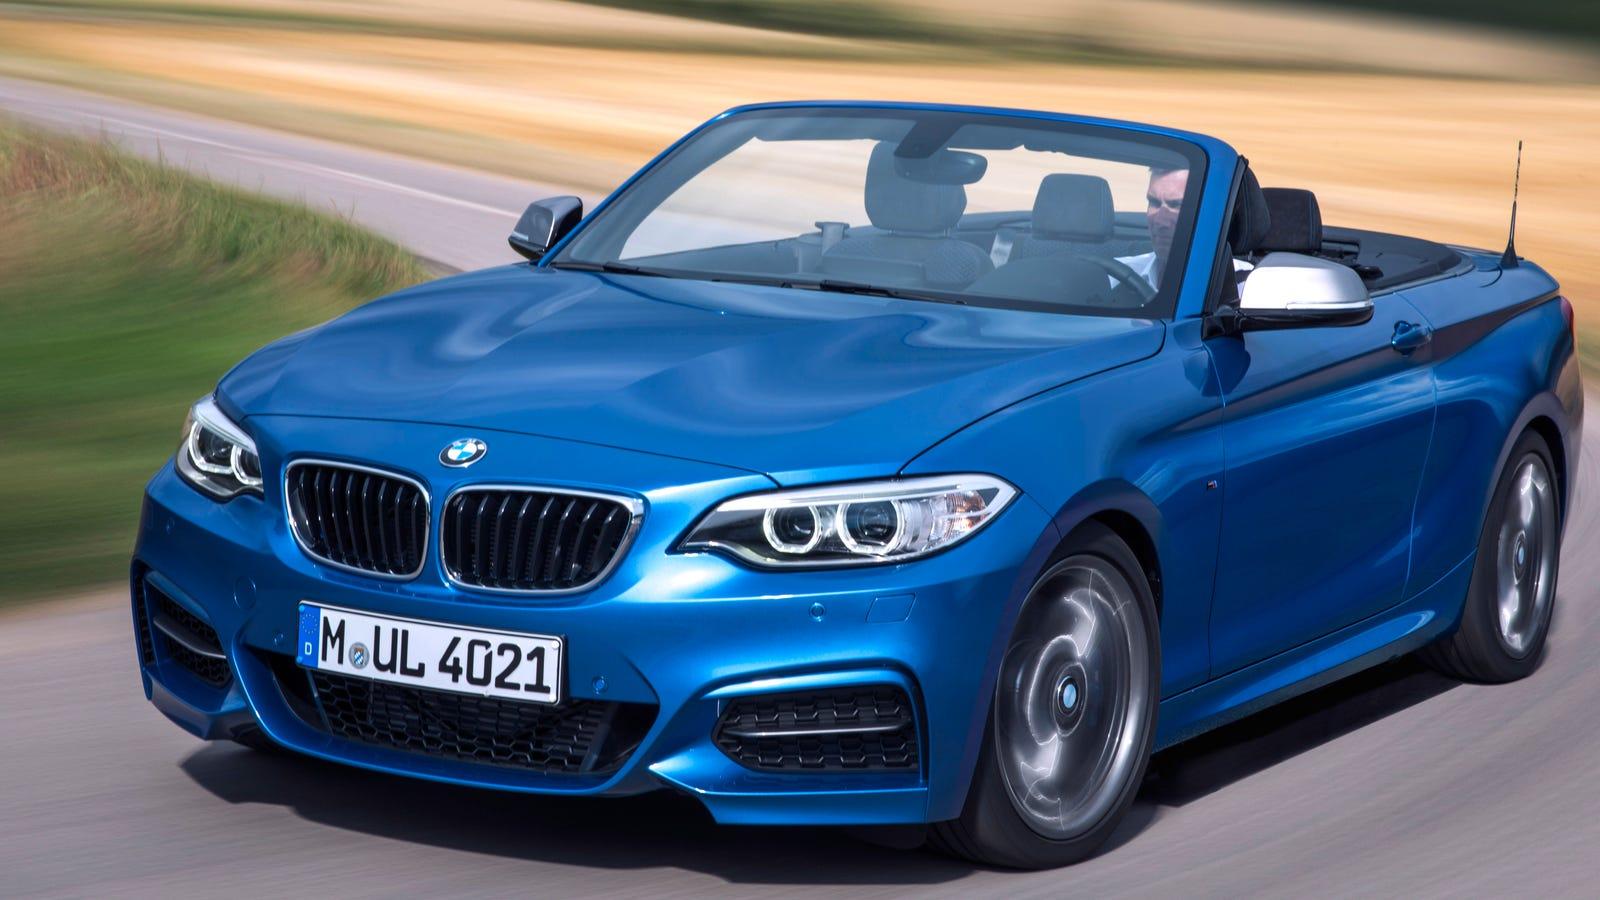 BMW M235i News Videos Reviews and Gossip  Jalopnik